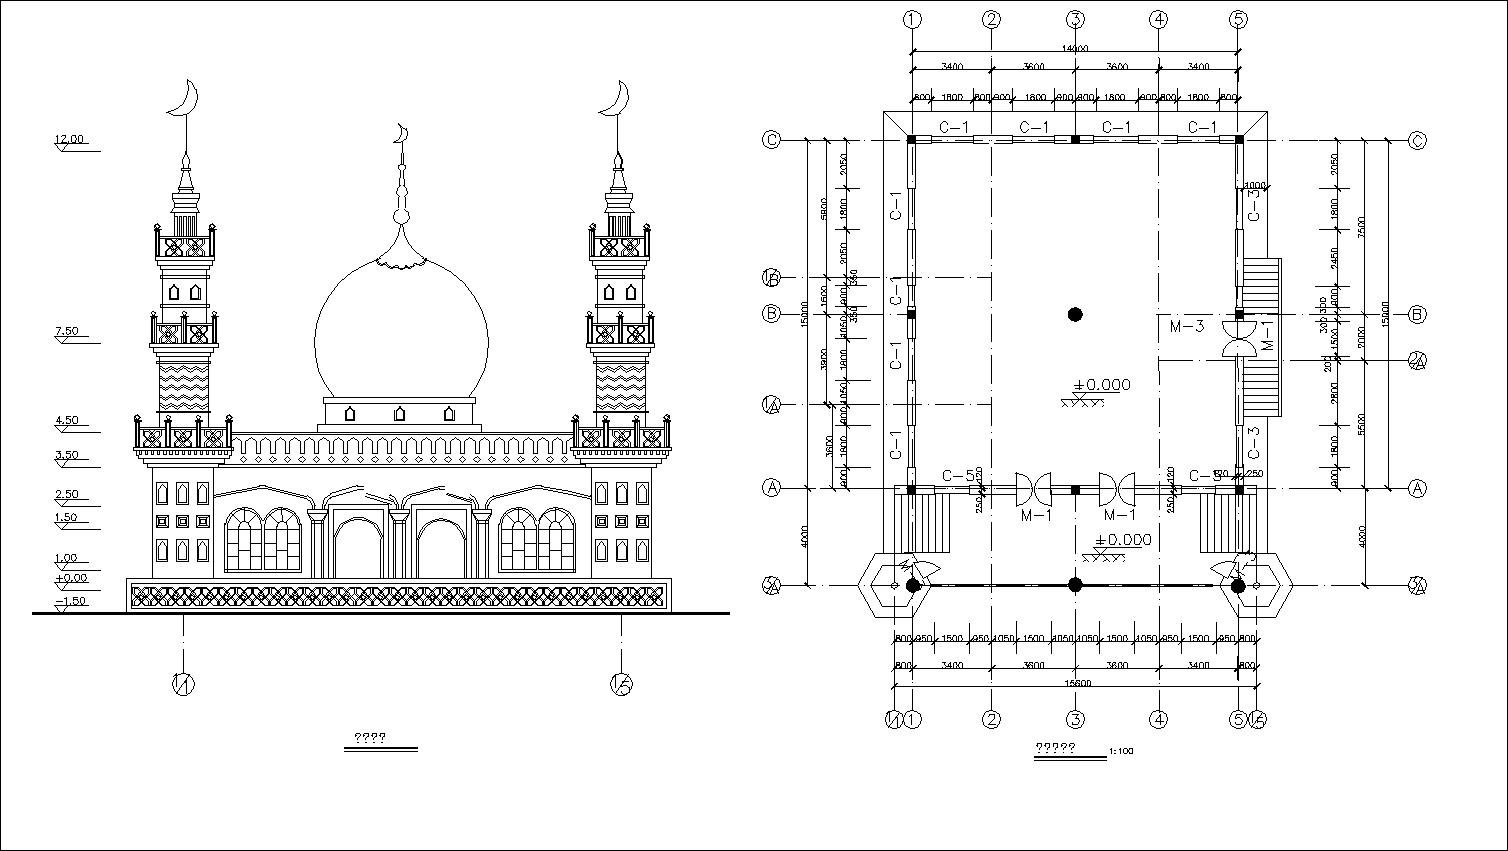 mosque drawings u3011 u2605